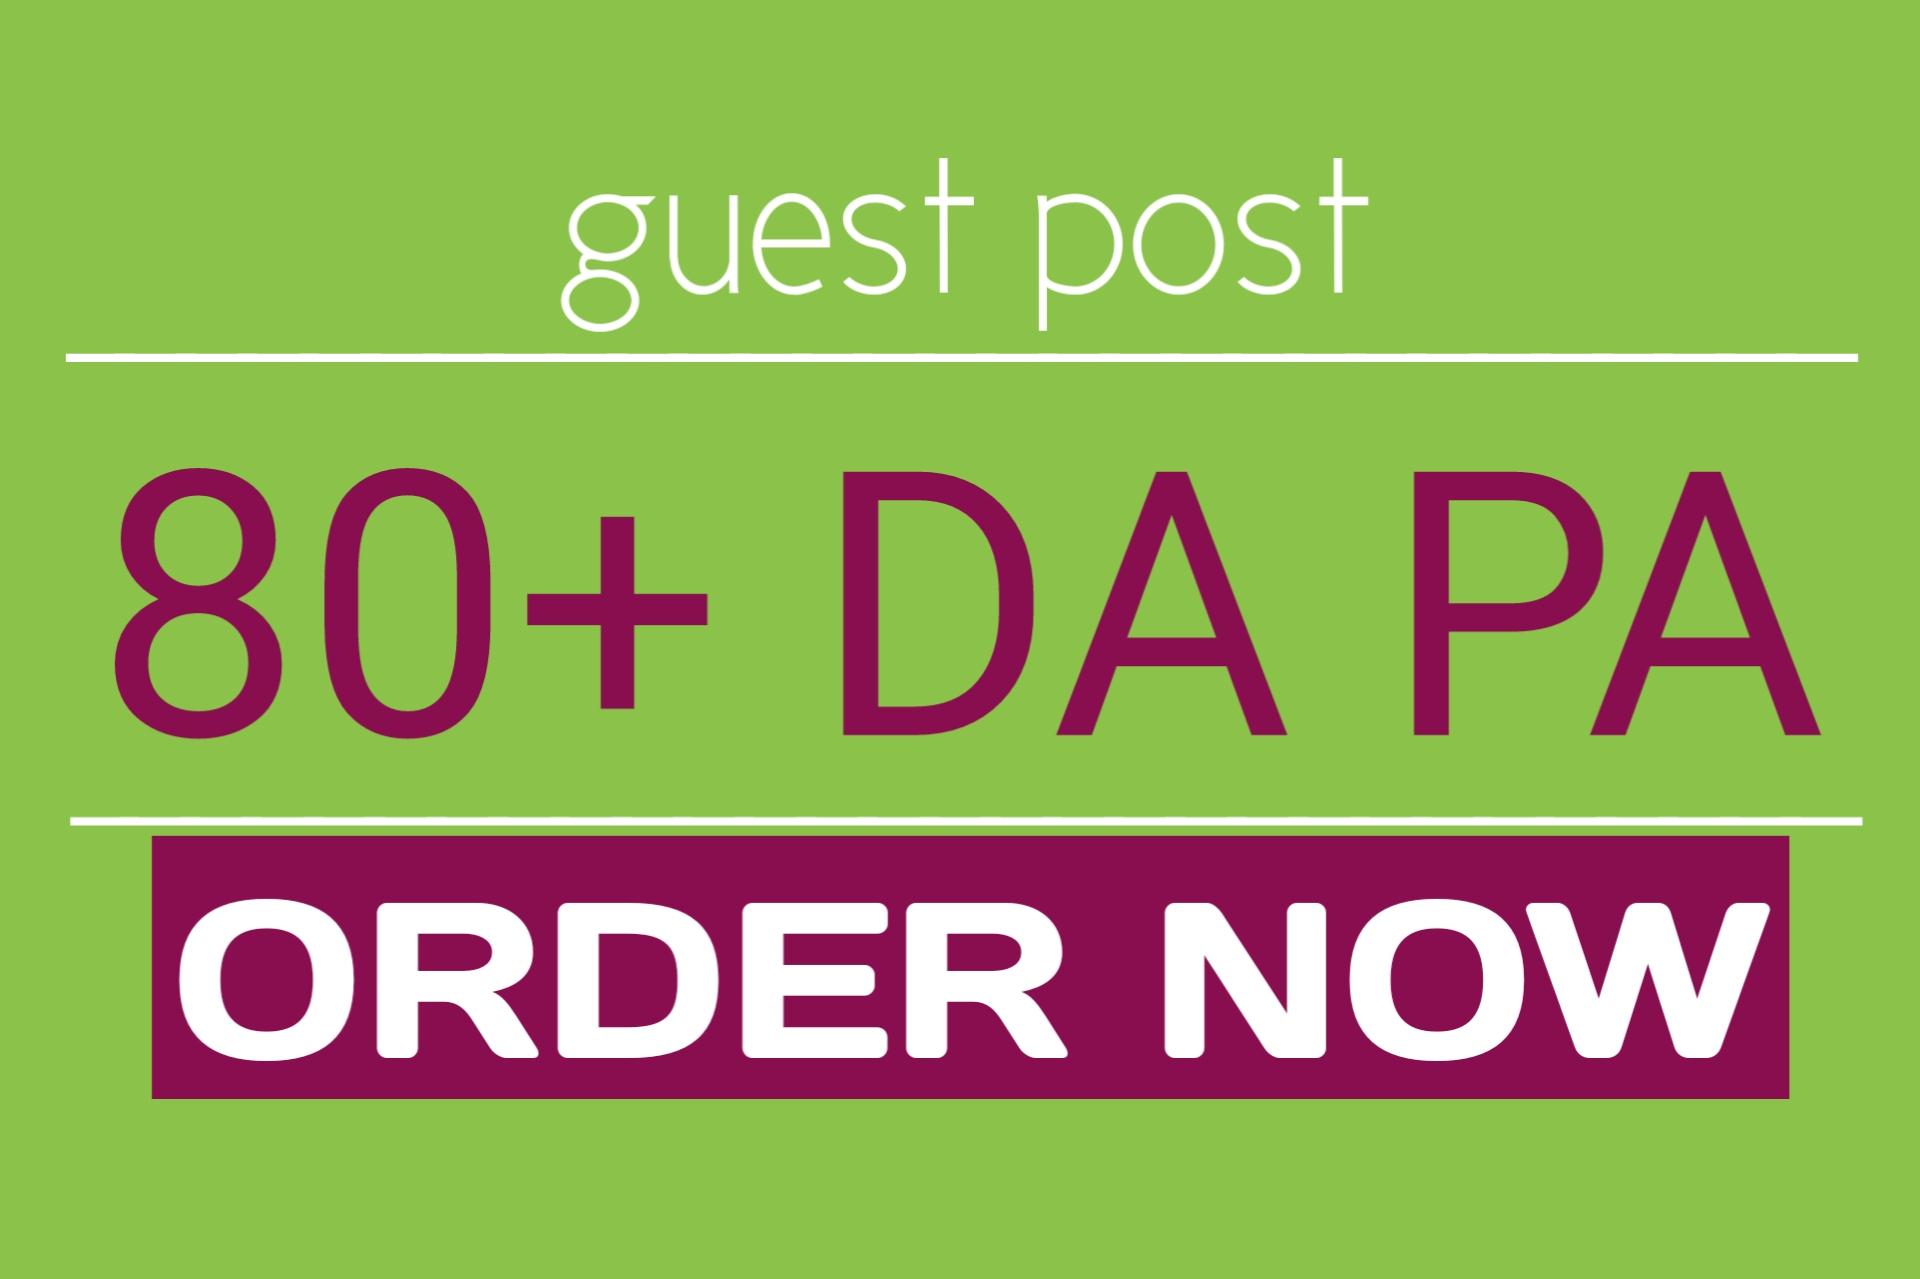 I will do post your article on bloglovin.com 80+ DA PA